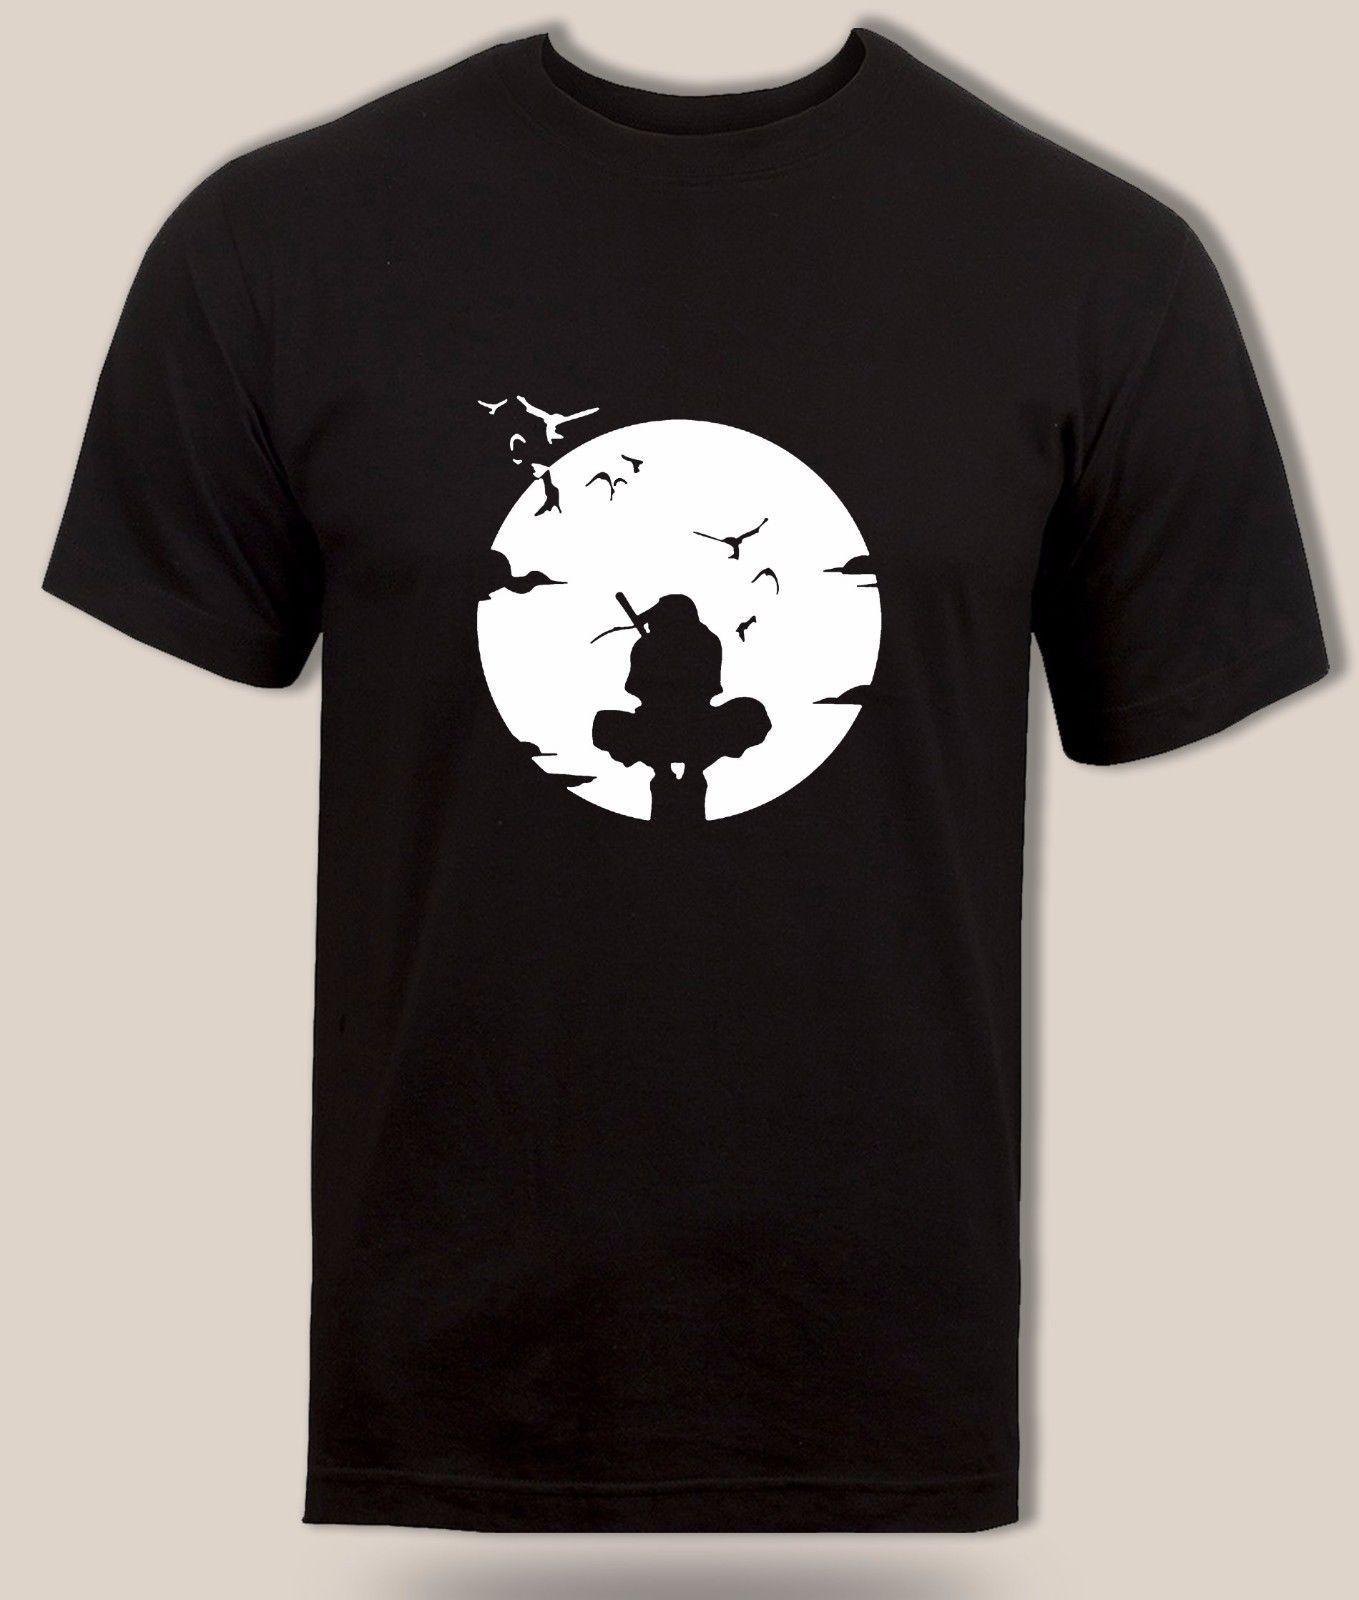 Uchiha Itachi t-shirt Hidden leaf village Anbu Black Ops Naruto Anime Adult  Kids